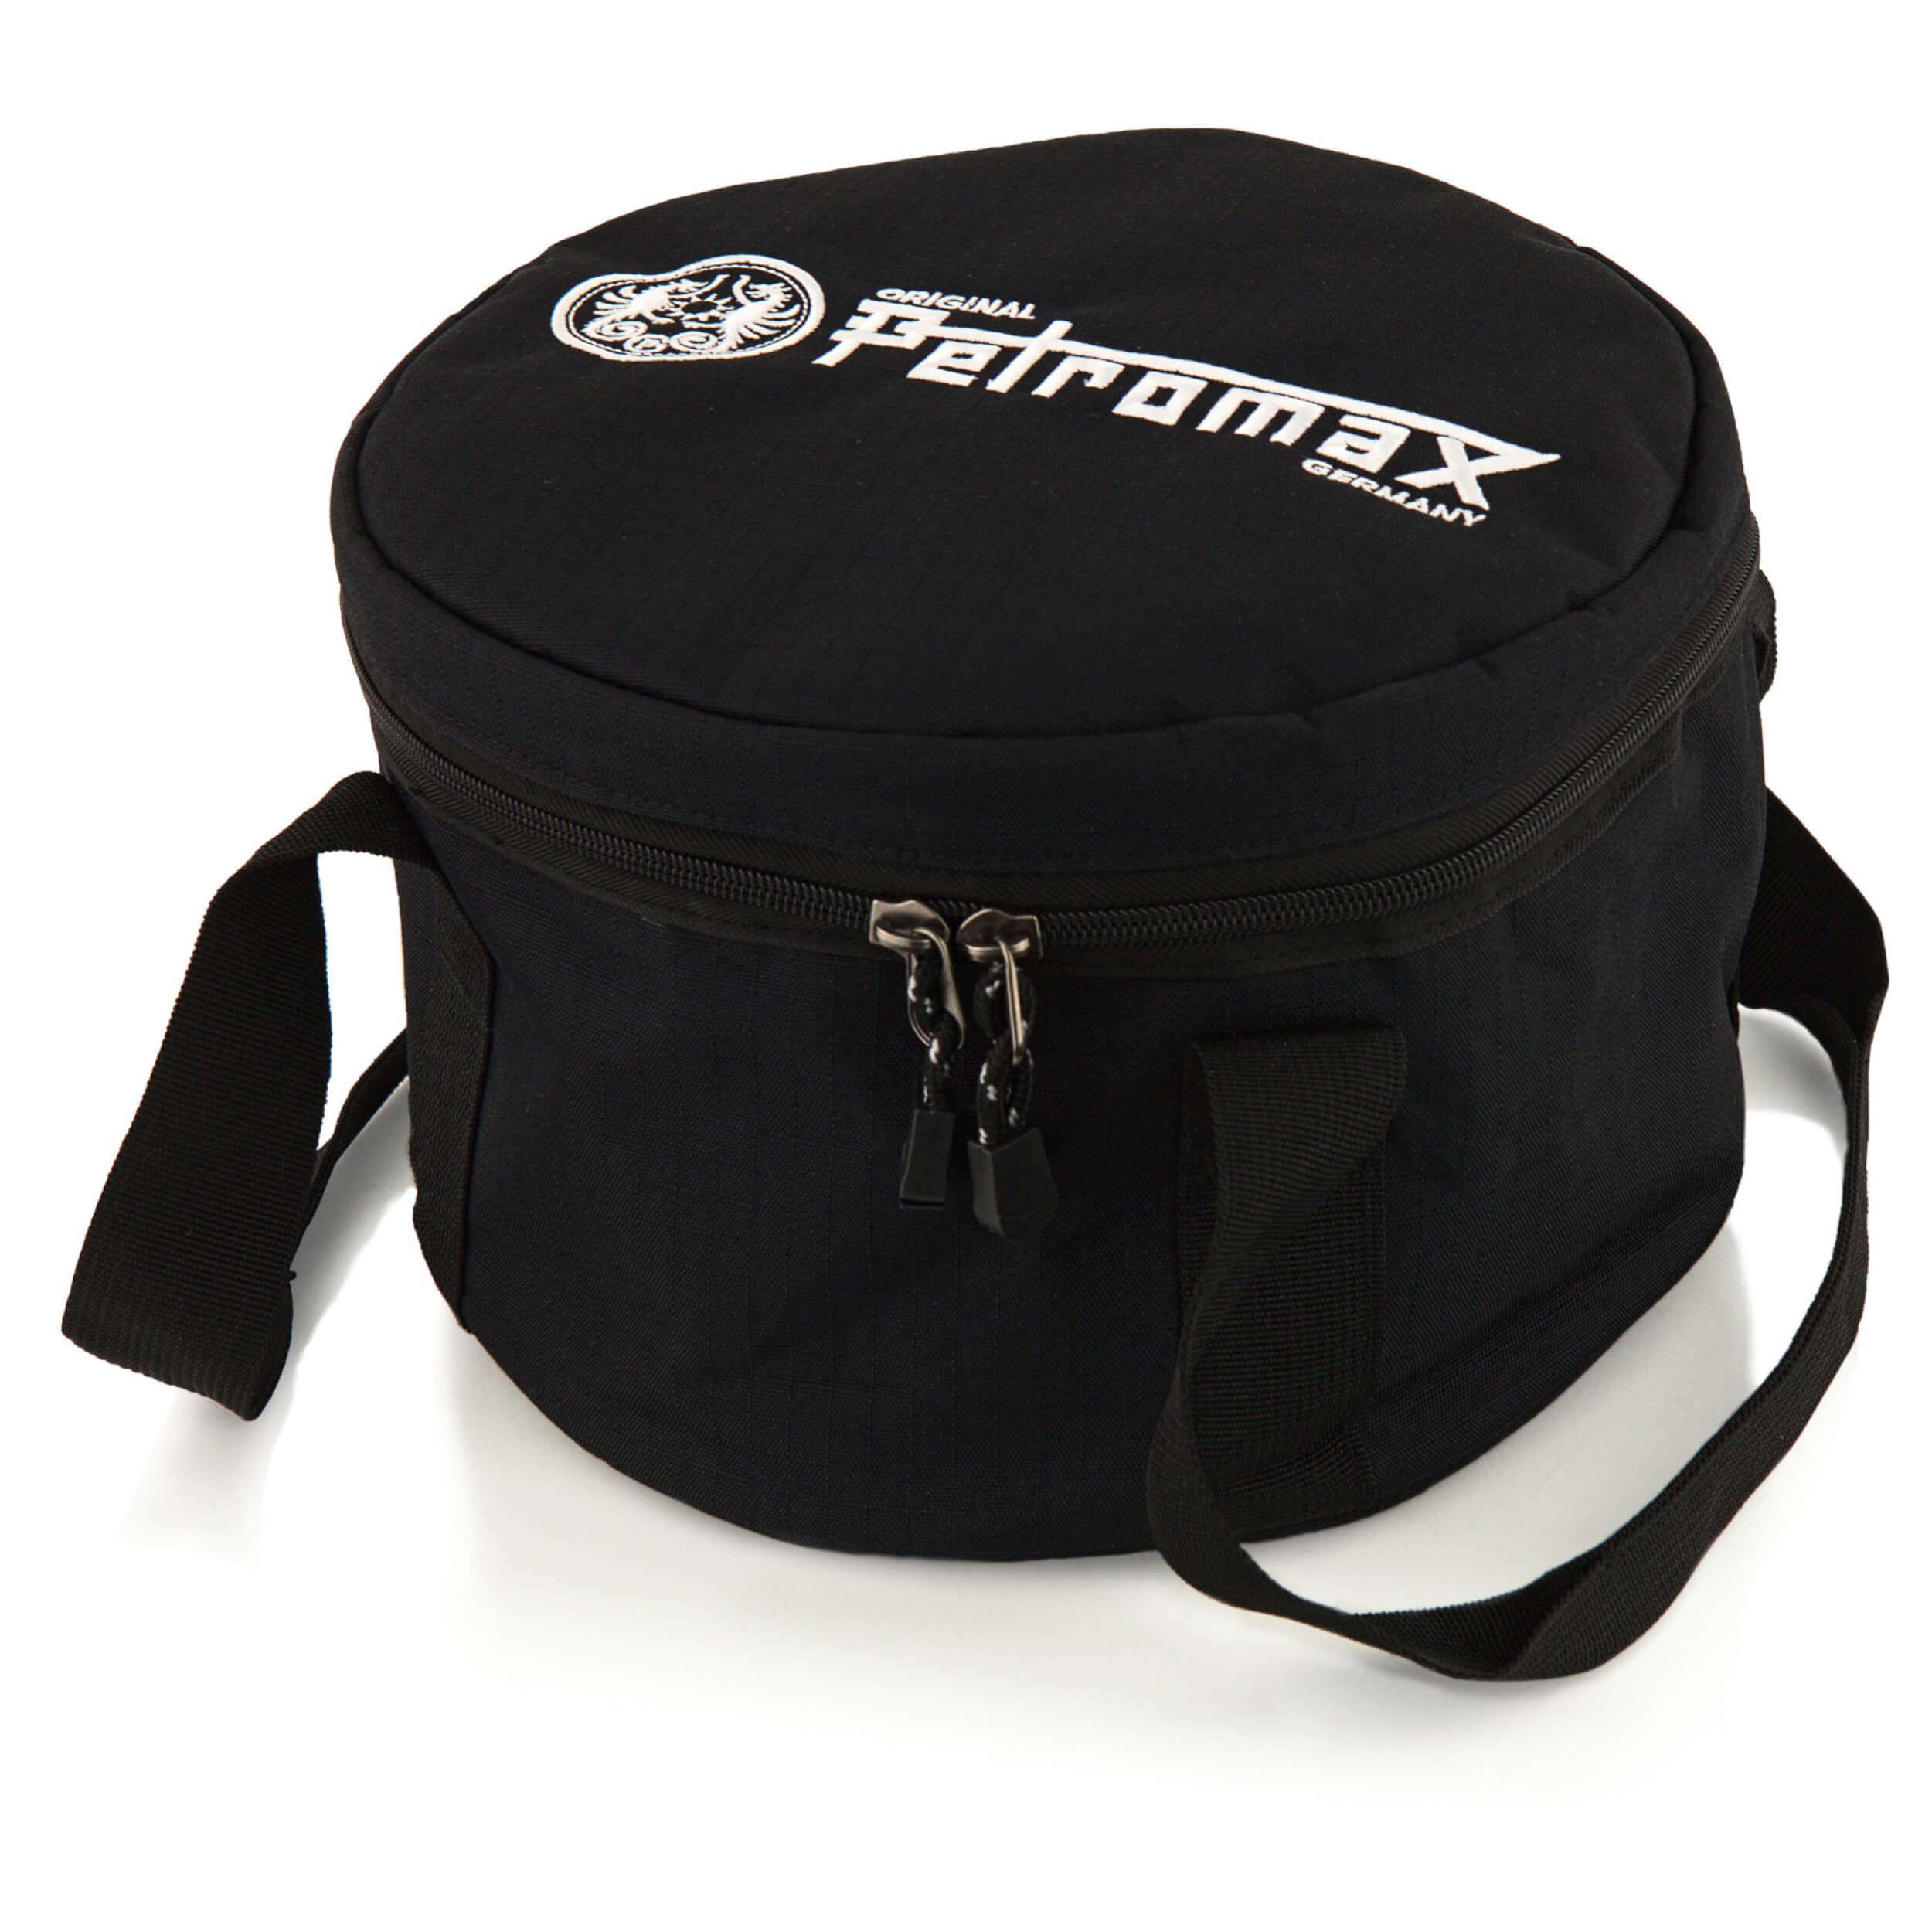 Petromax Transporttasche für Feuertopf für ft12, ft18, Feuergrill tg3 & Atago